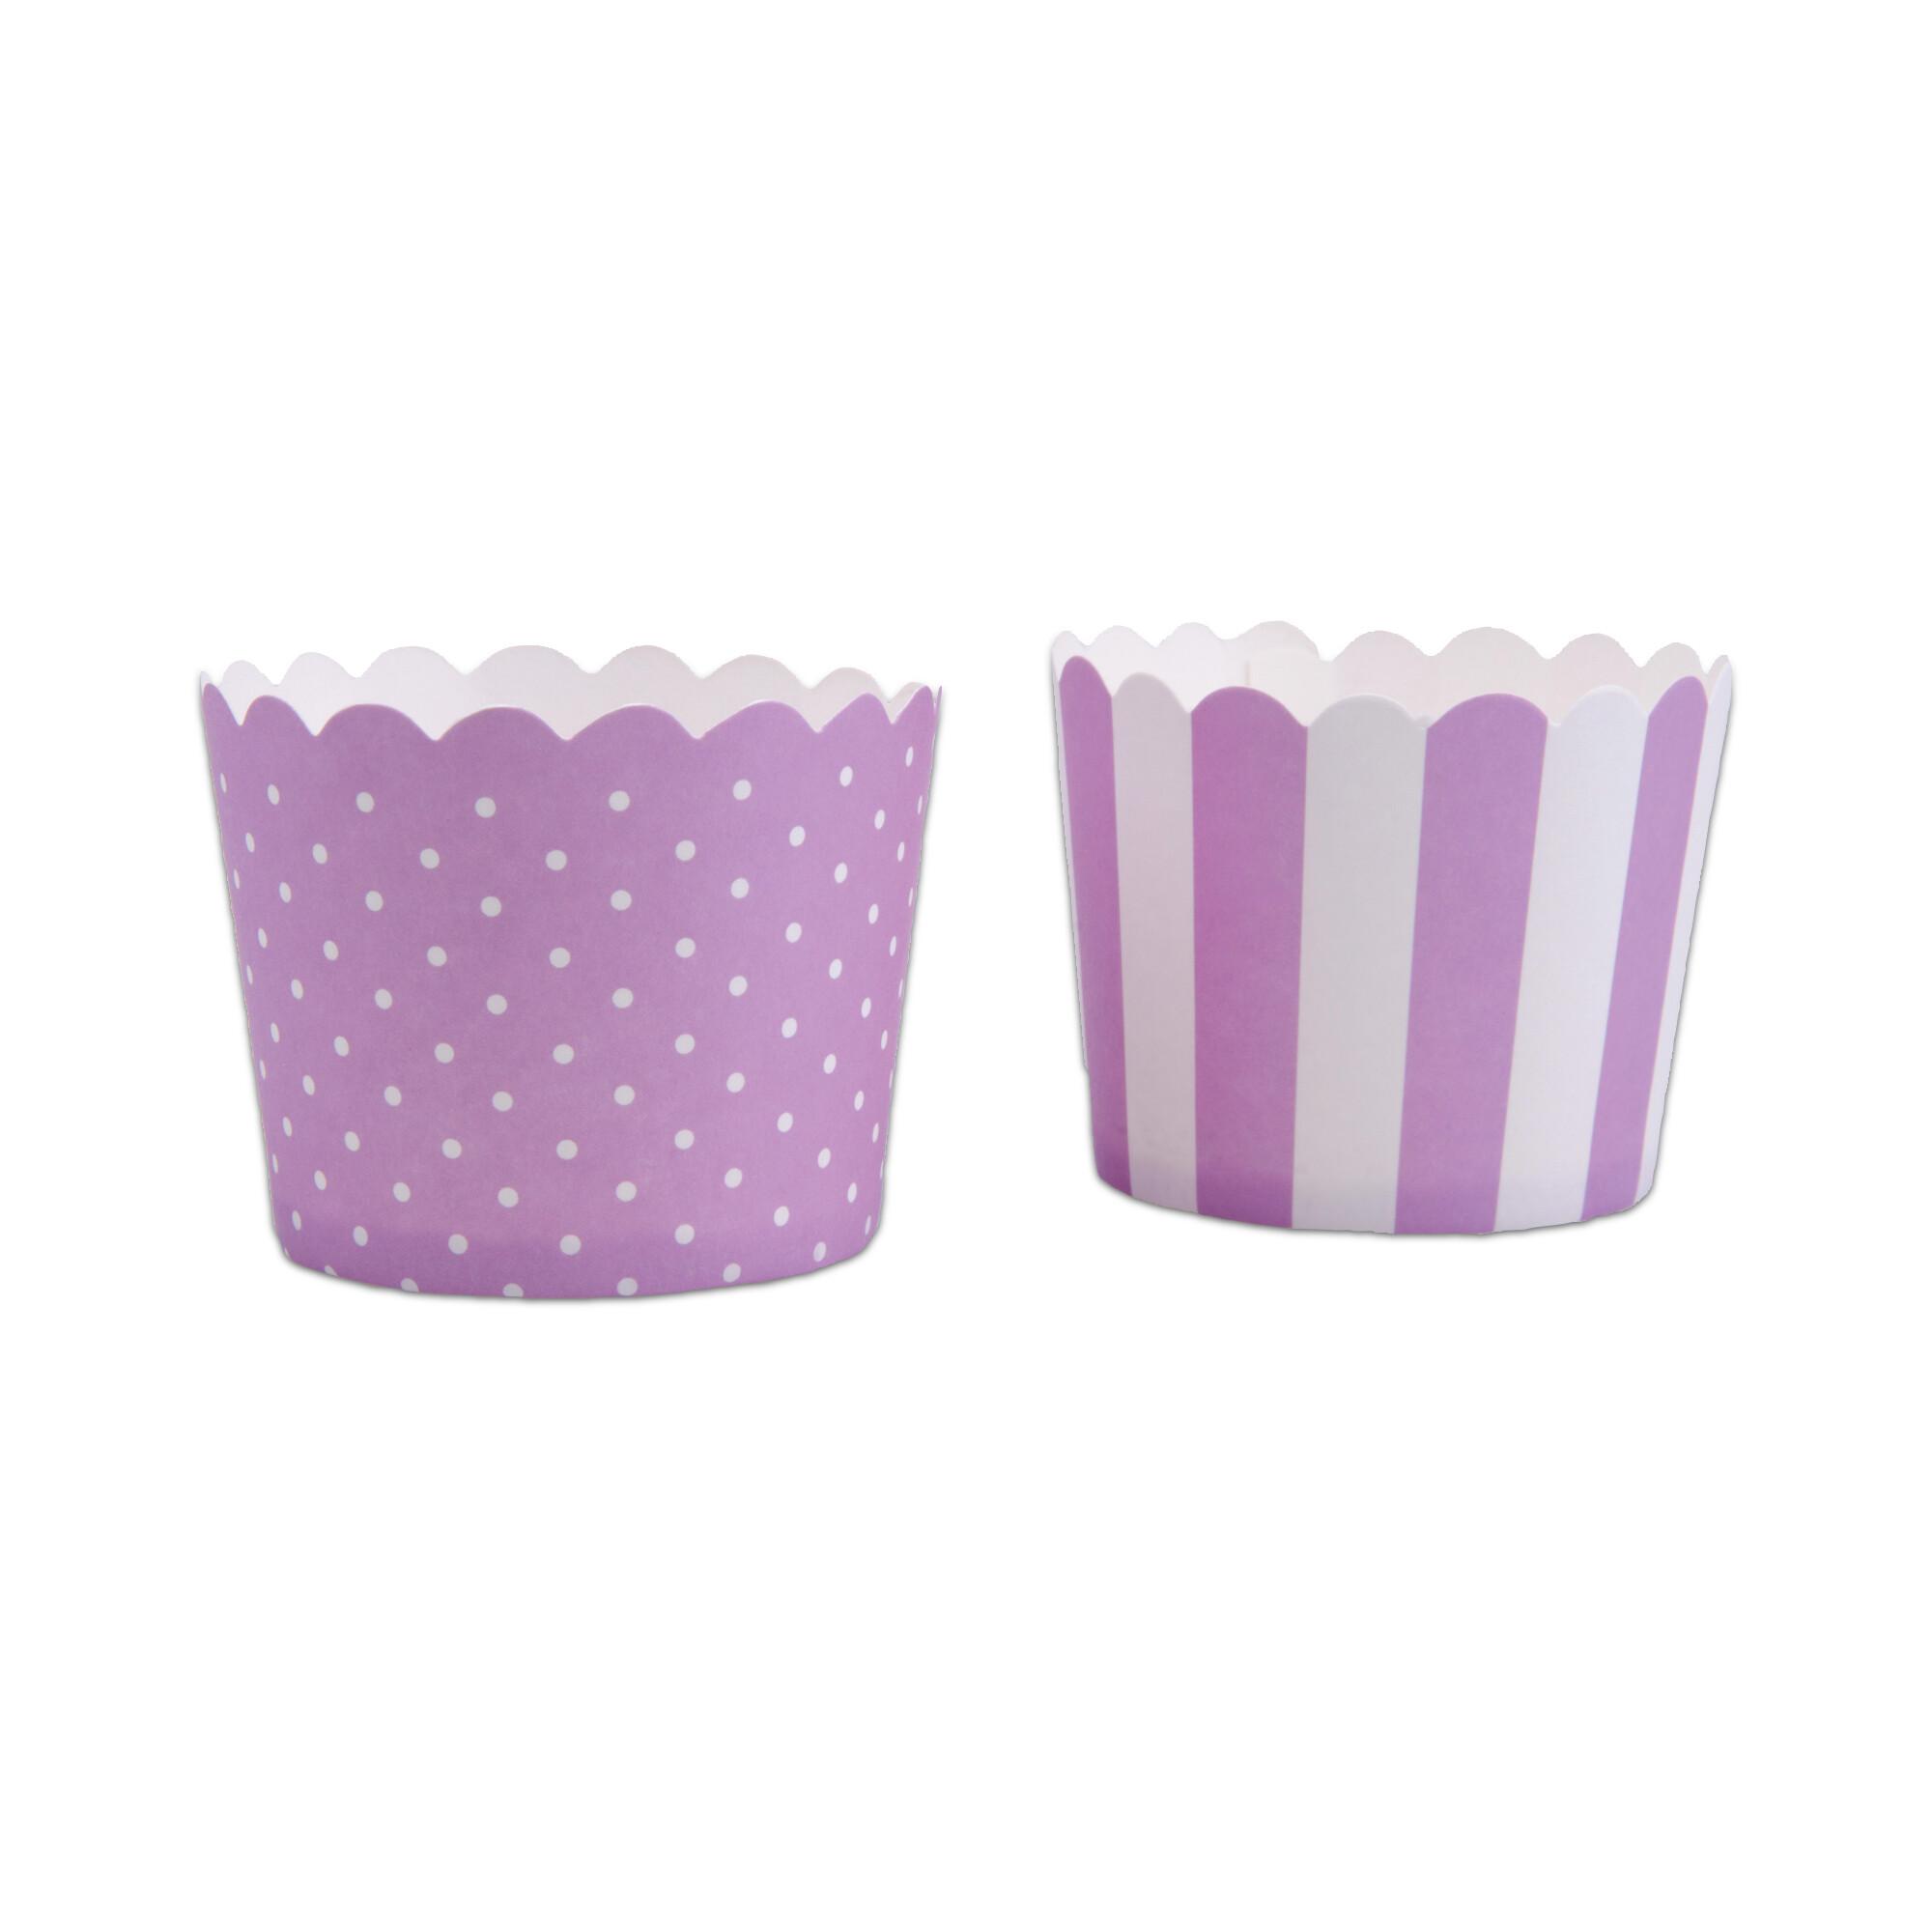 Cupcake liner - Lilac white - Mini - 12 pieces